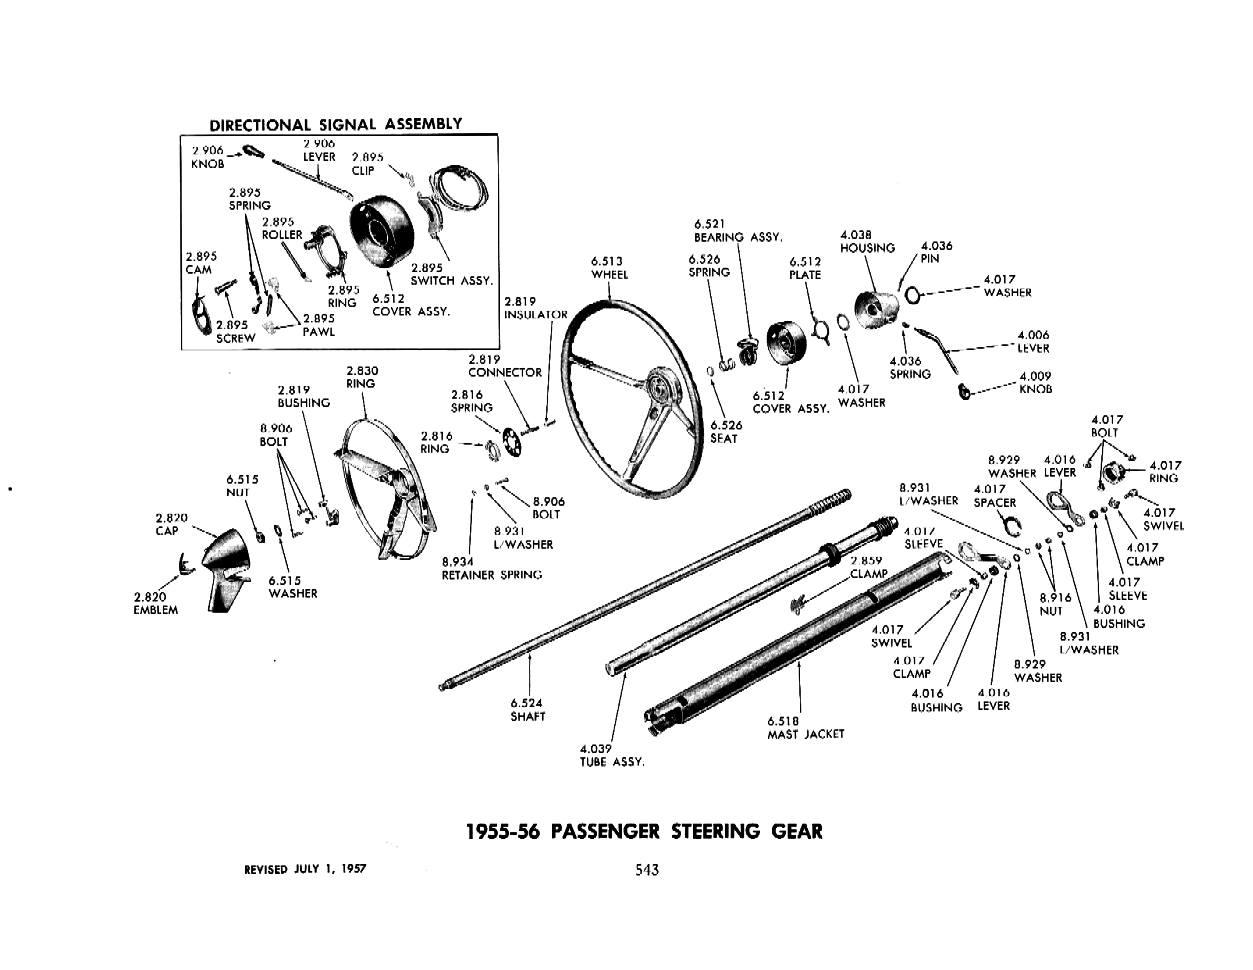 1955 chevy steering column diagram wc 9474  chevrolet truck steering column diagram  chevrolet truck steering column diagram